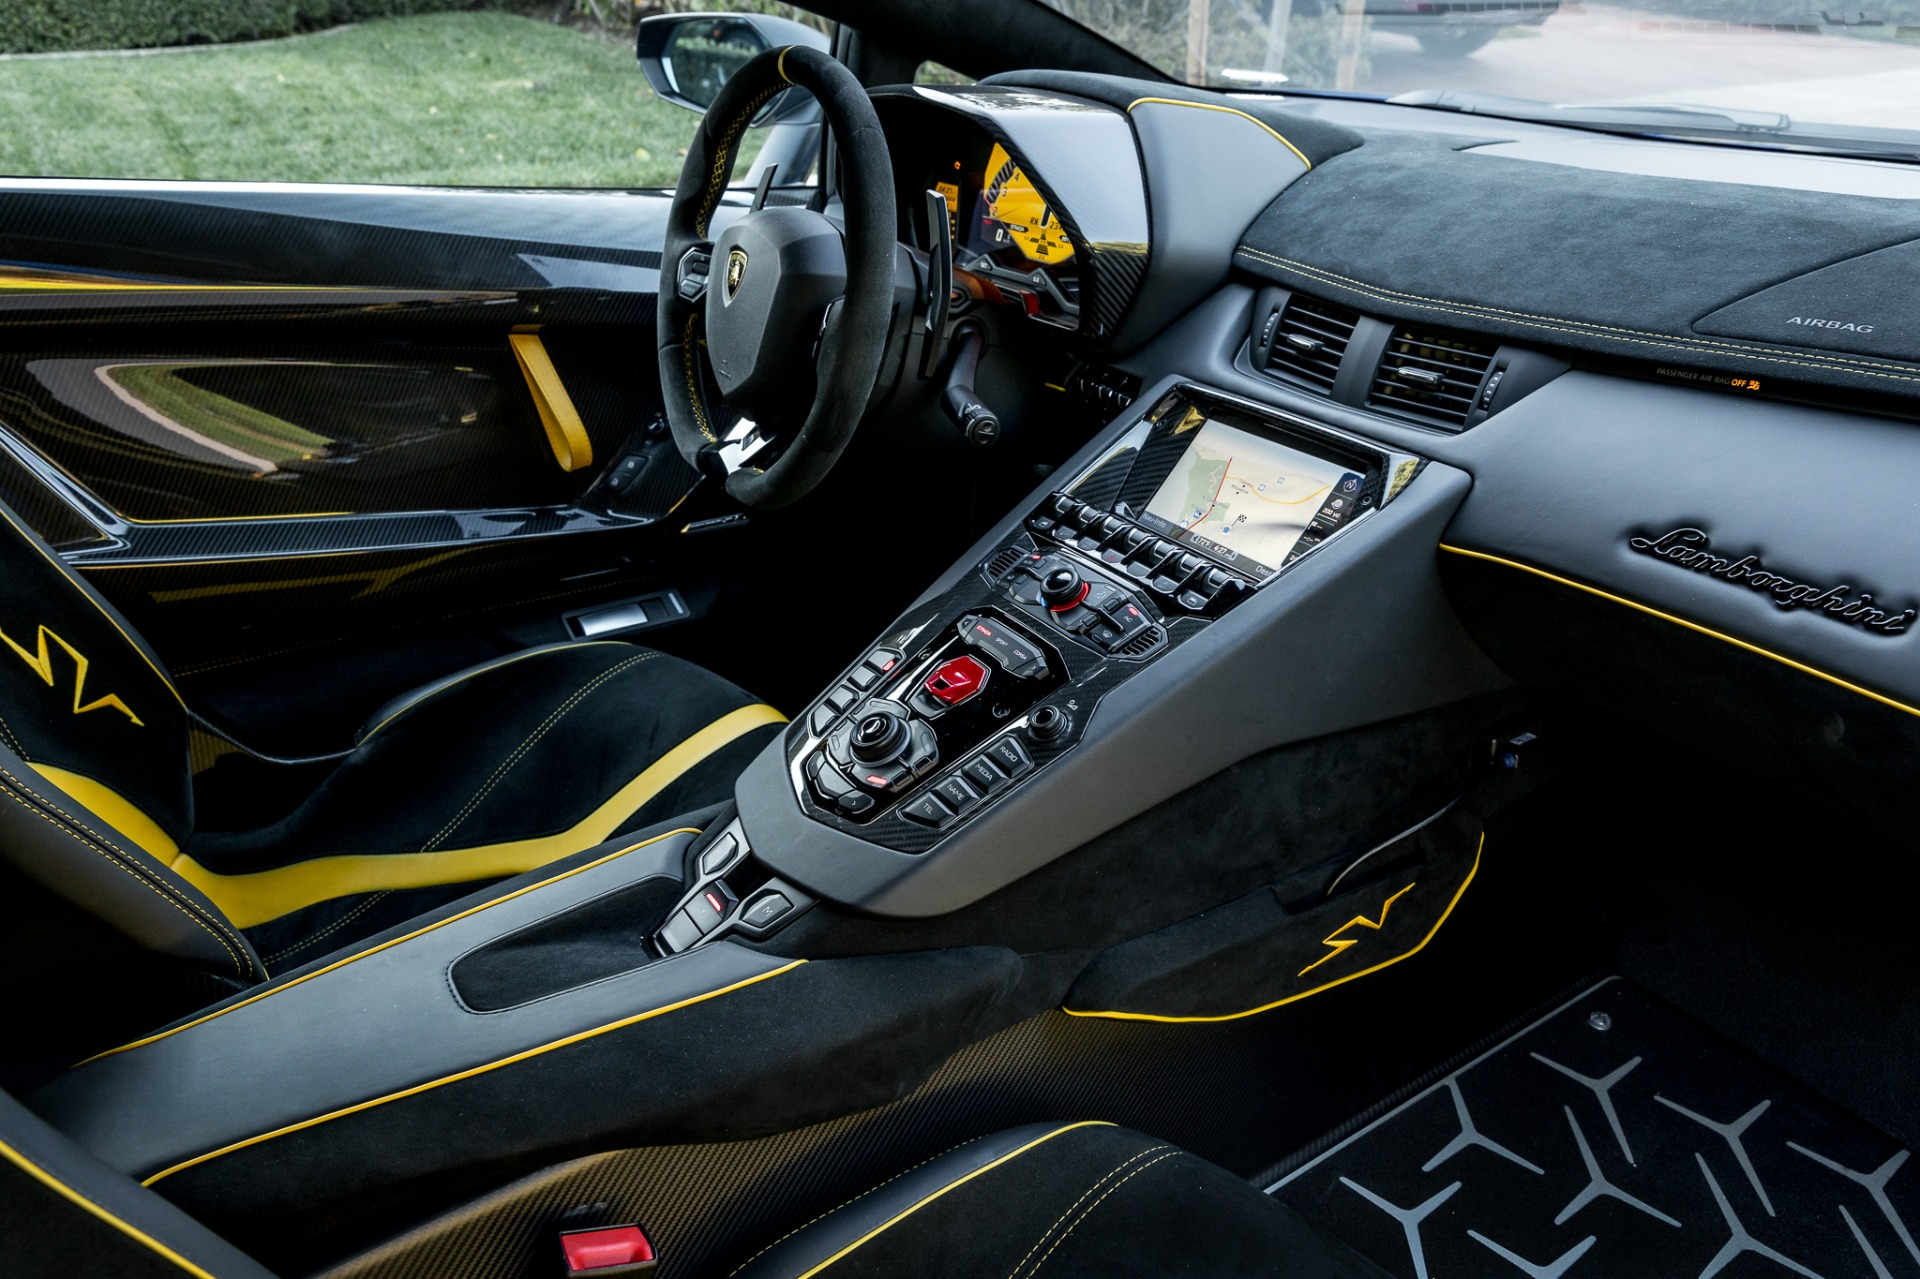 Used 2017 Lamborghini Aventador LP 750-4 SV / 740HP / AWD / 1930 MI / NAV / CAMERA for sale Sold at Formula Imports in Charlotte NC 28227 60